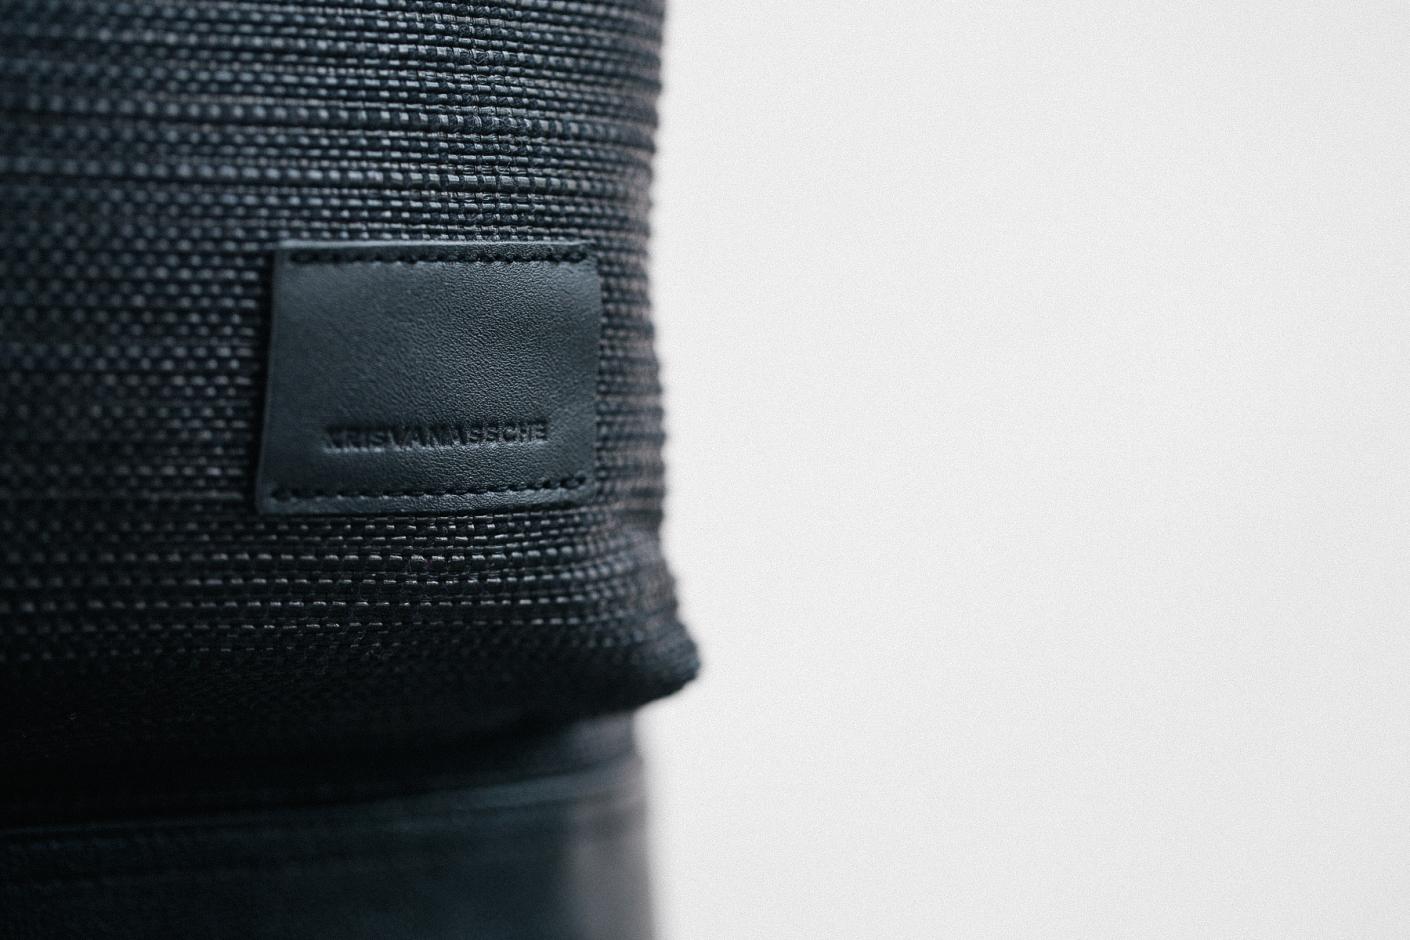 krisvanassche-2014-fall-winter-basket-weave-backpacks-2